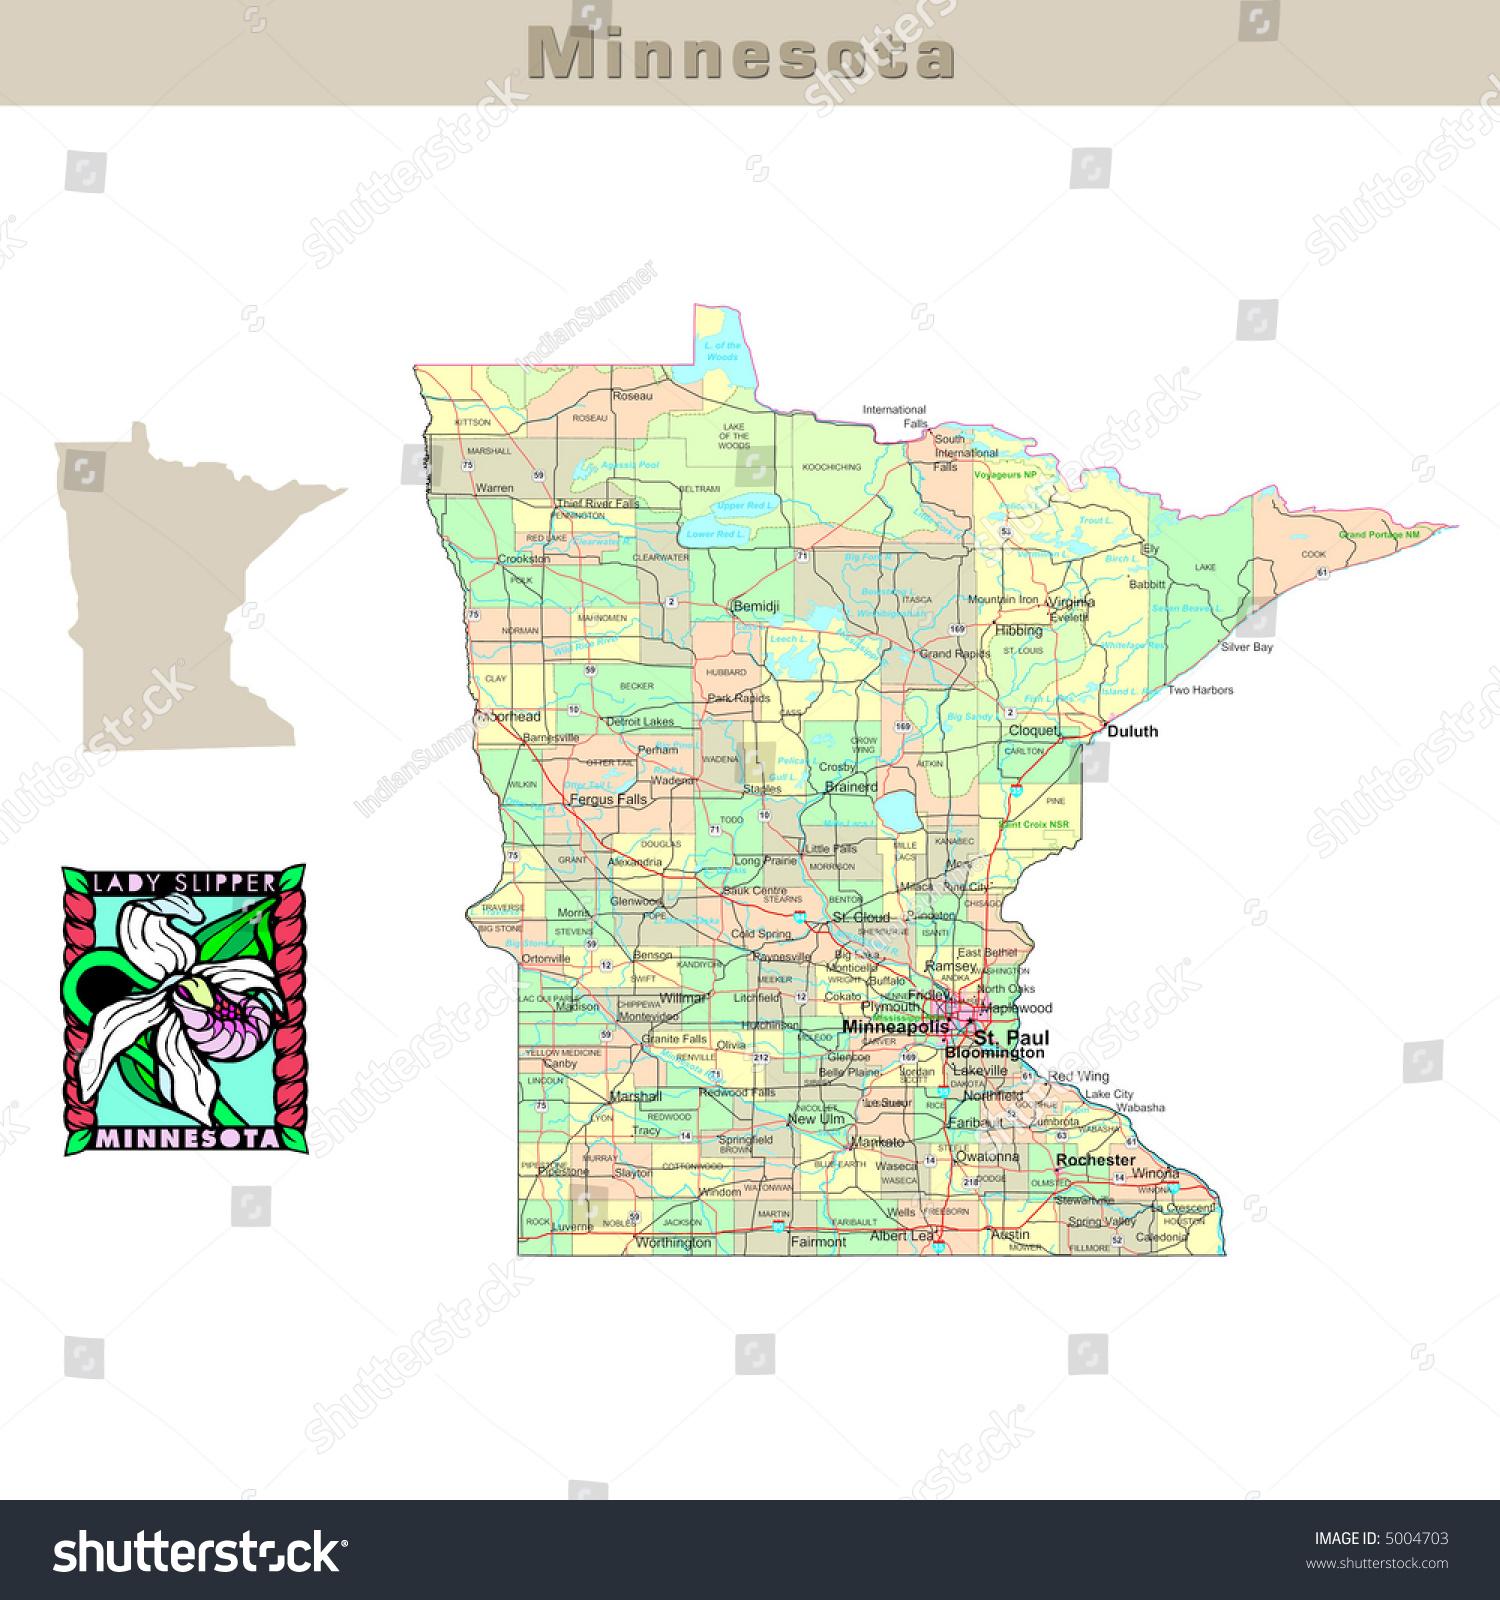 Image of: Usa States Series Minnesota Political Map Stock Illustration 5004703